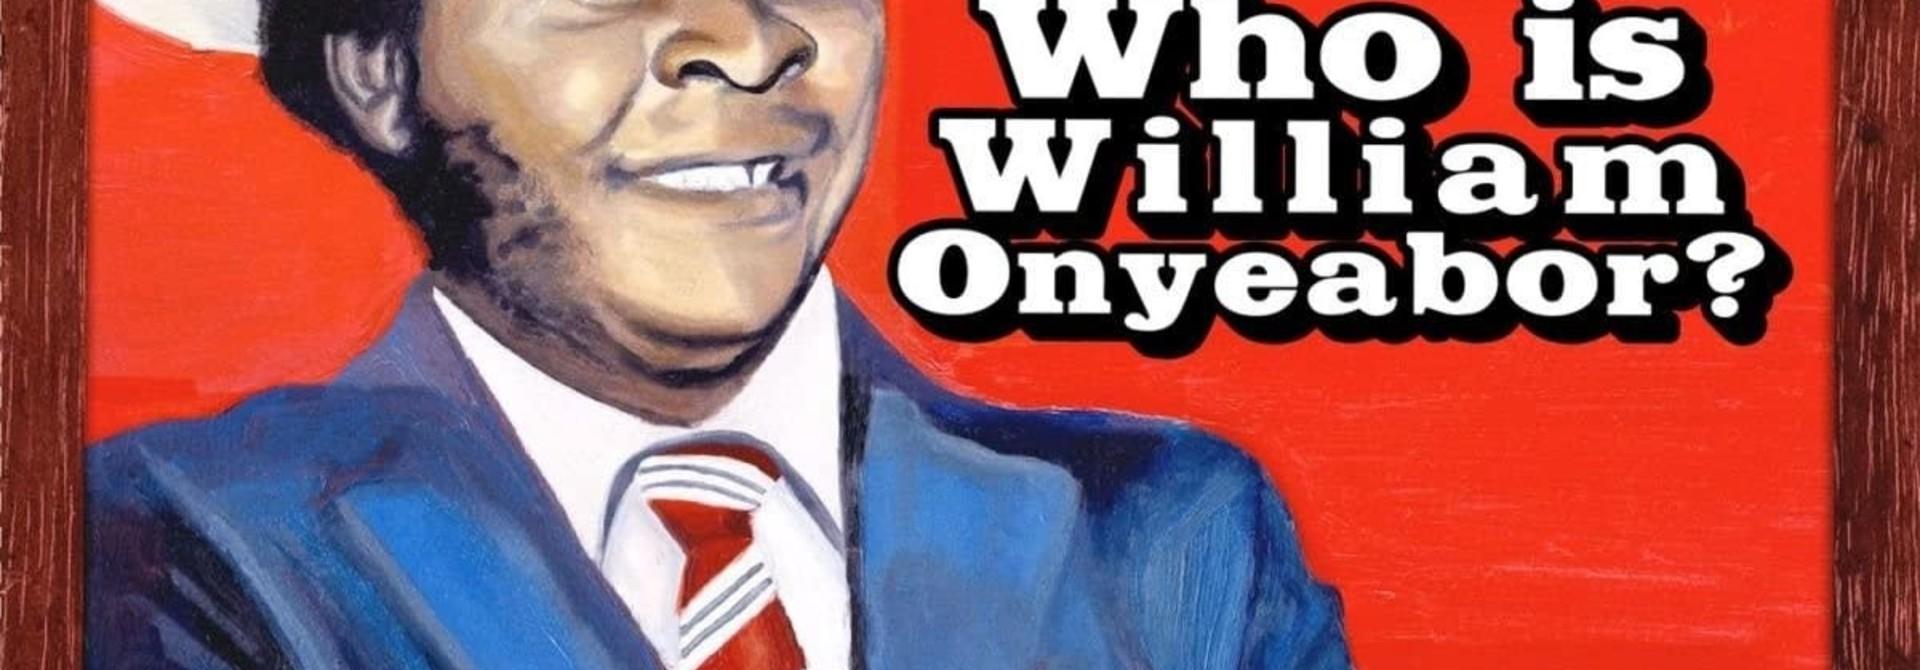 William Onyeabor • Who Is William Onyeabor?